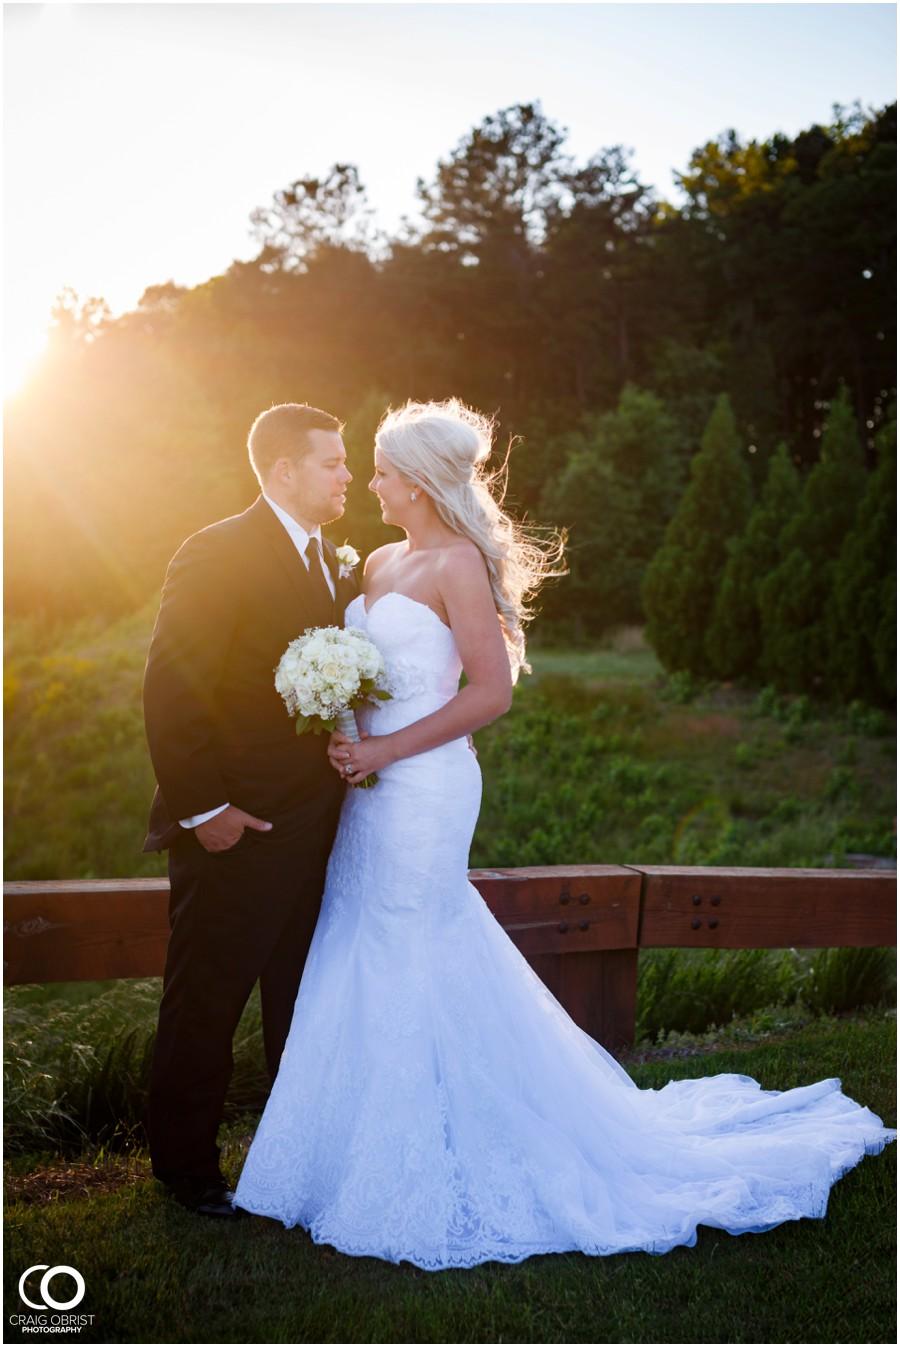 Lake-Lanier-Islands-Wedding-Golf-Course-Atlanta-Portraits_0063.jpg